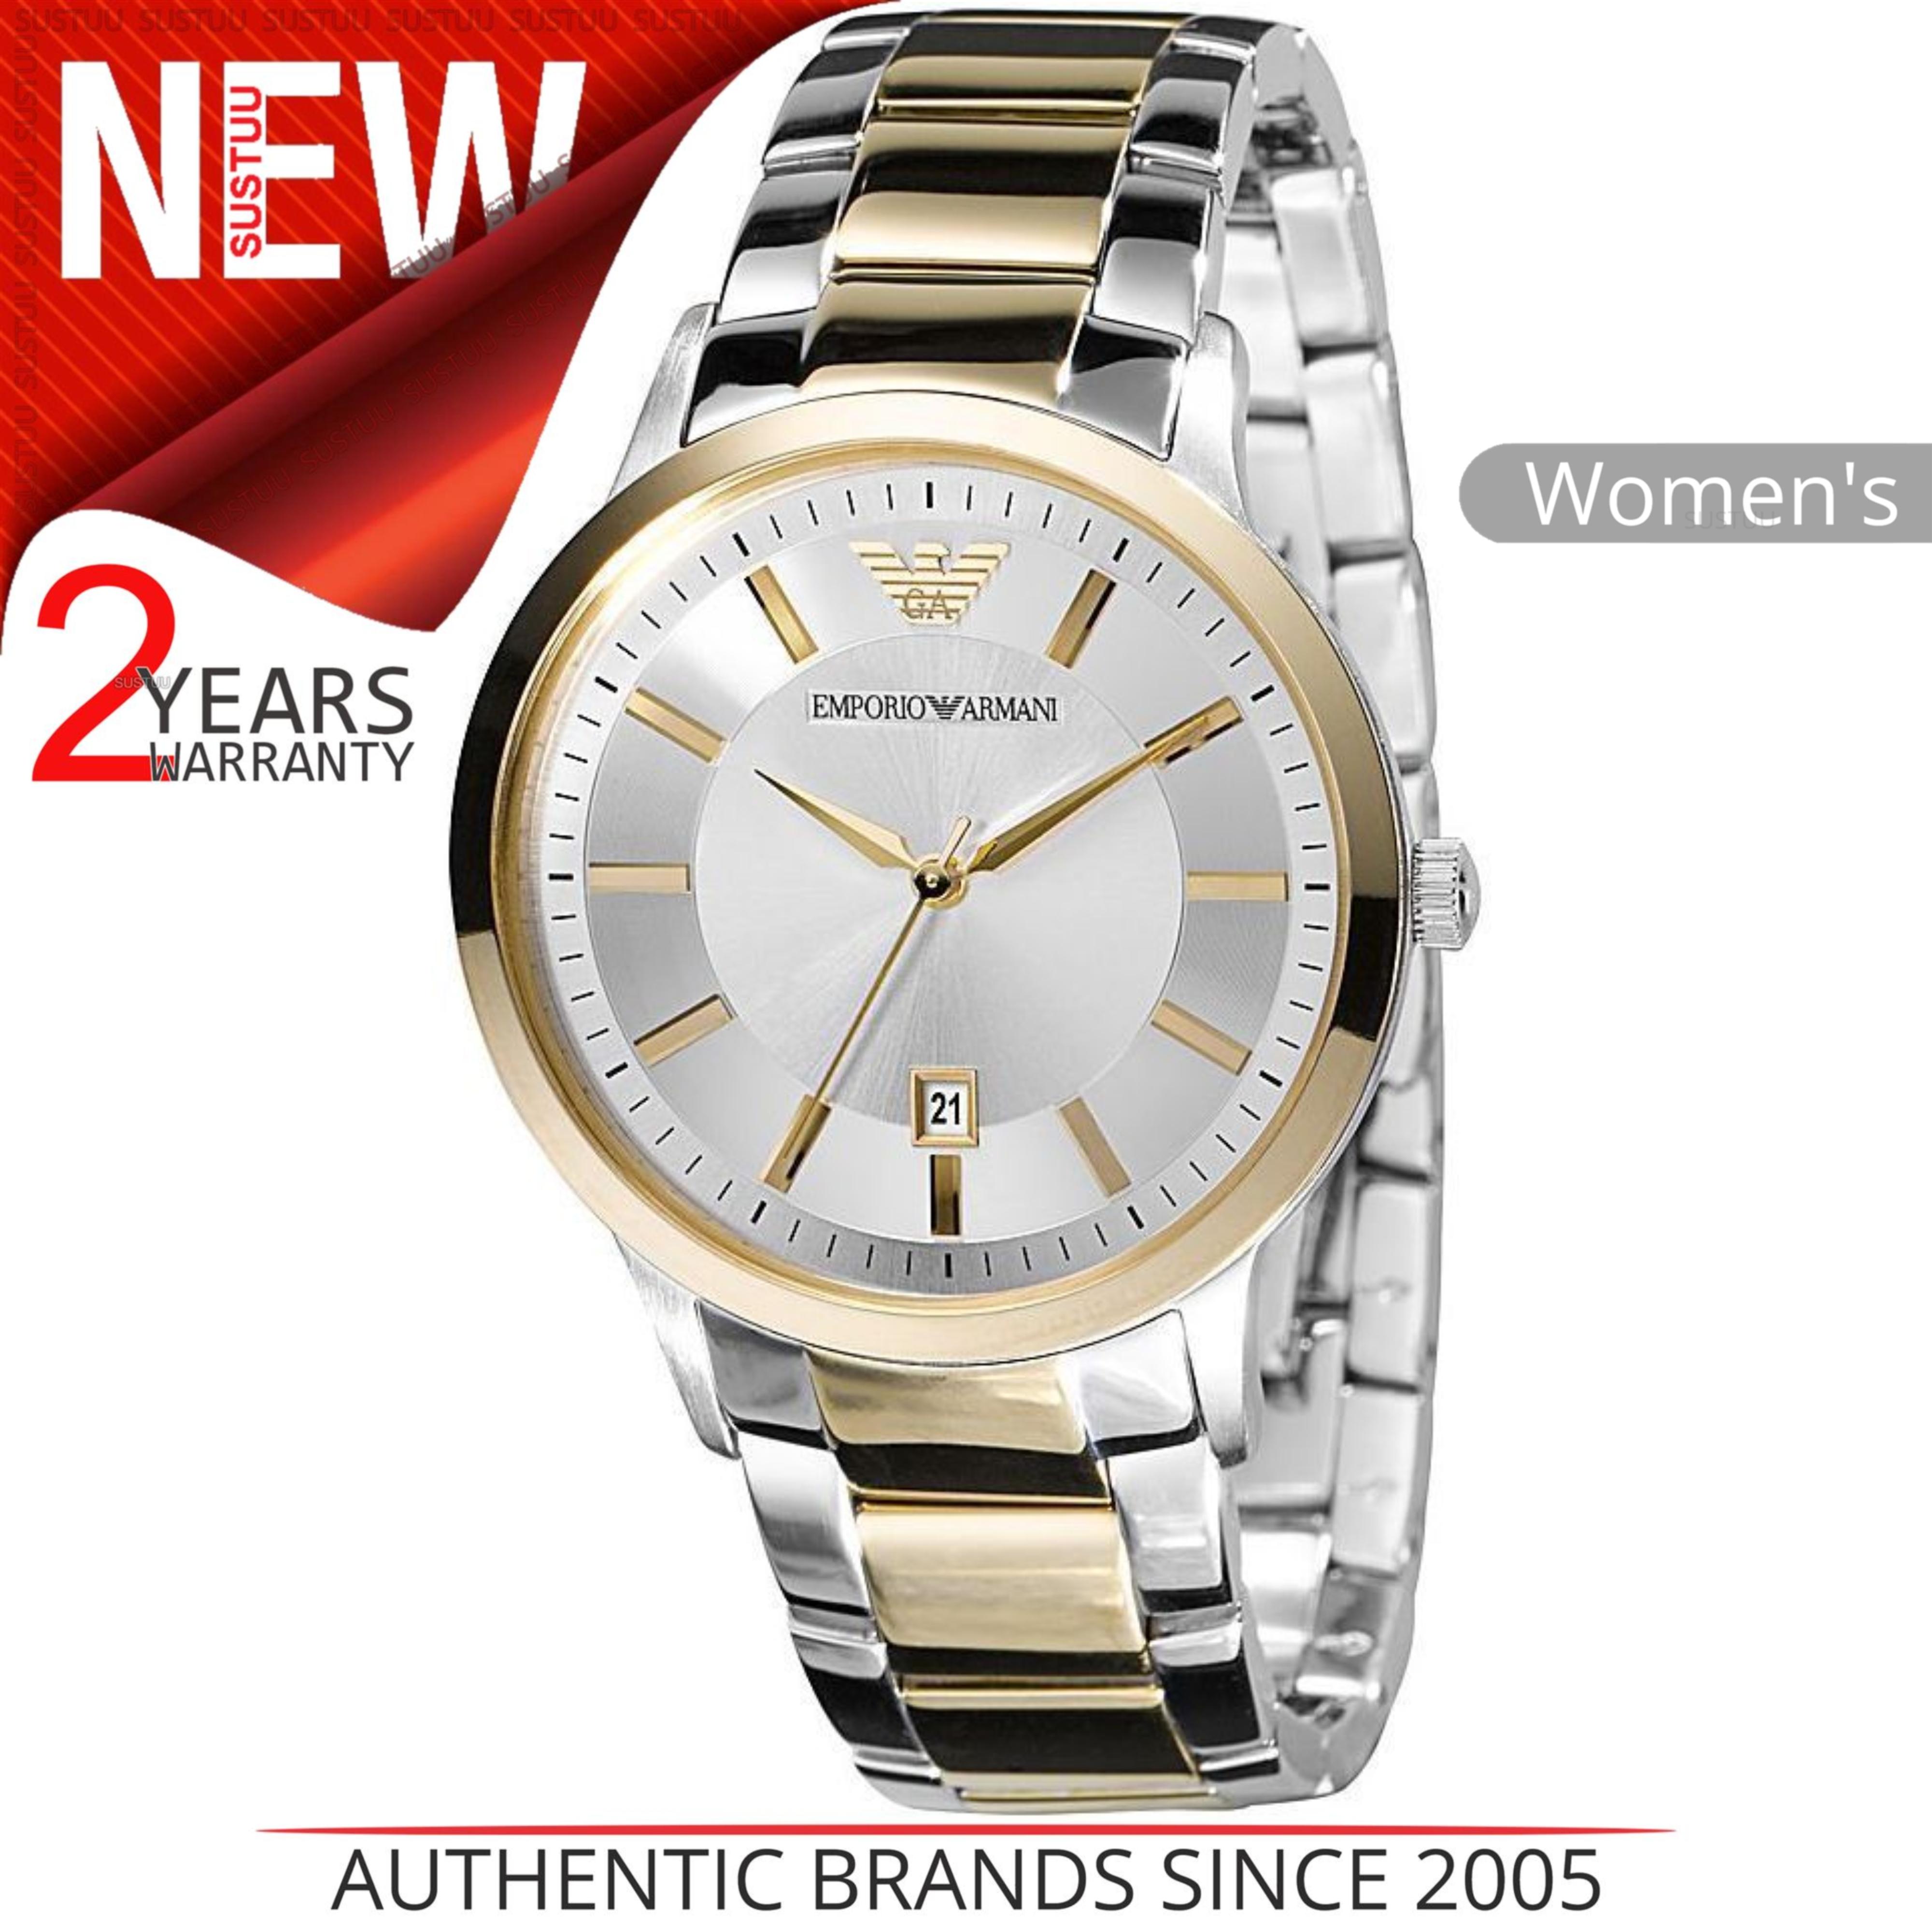 Emporio Armani Ladies' Formal Watch|Round Dial|Dual Tone Bracelet Band|AR2450